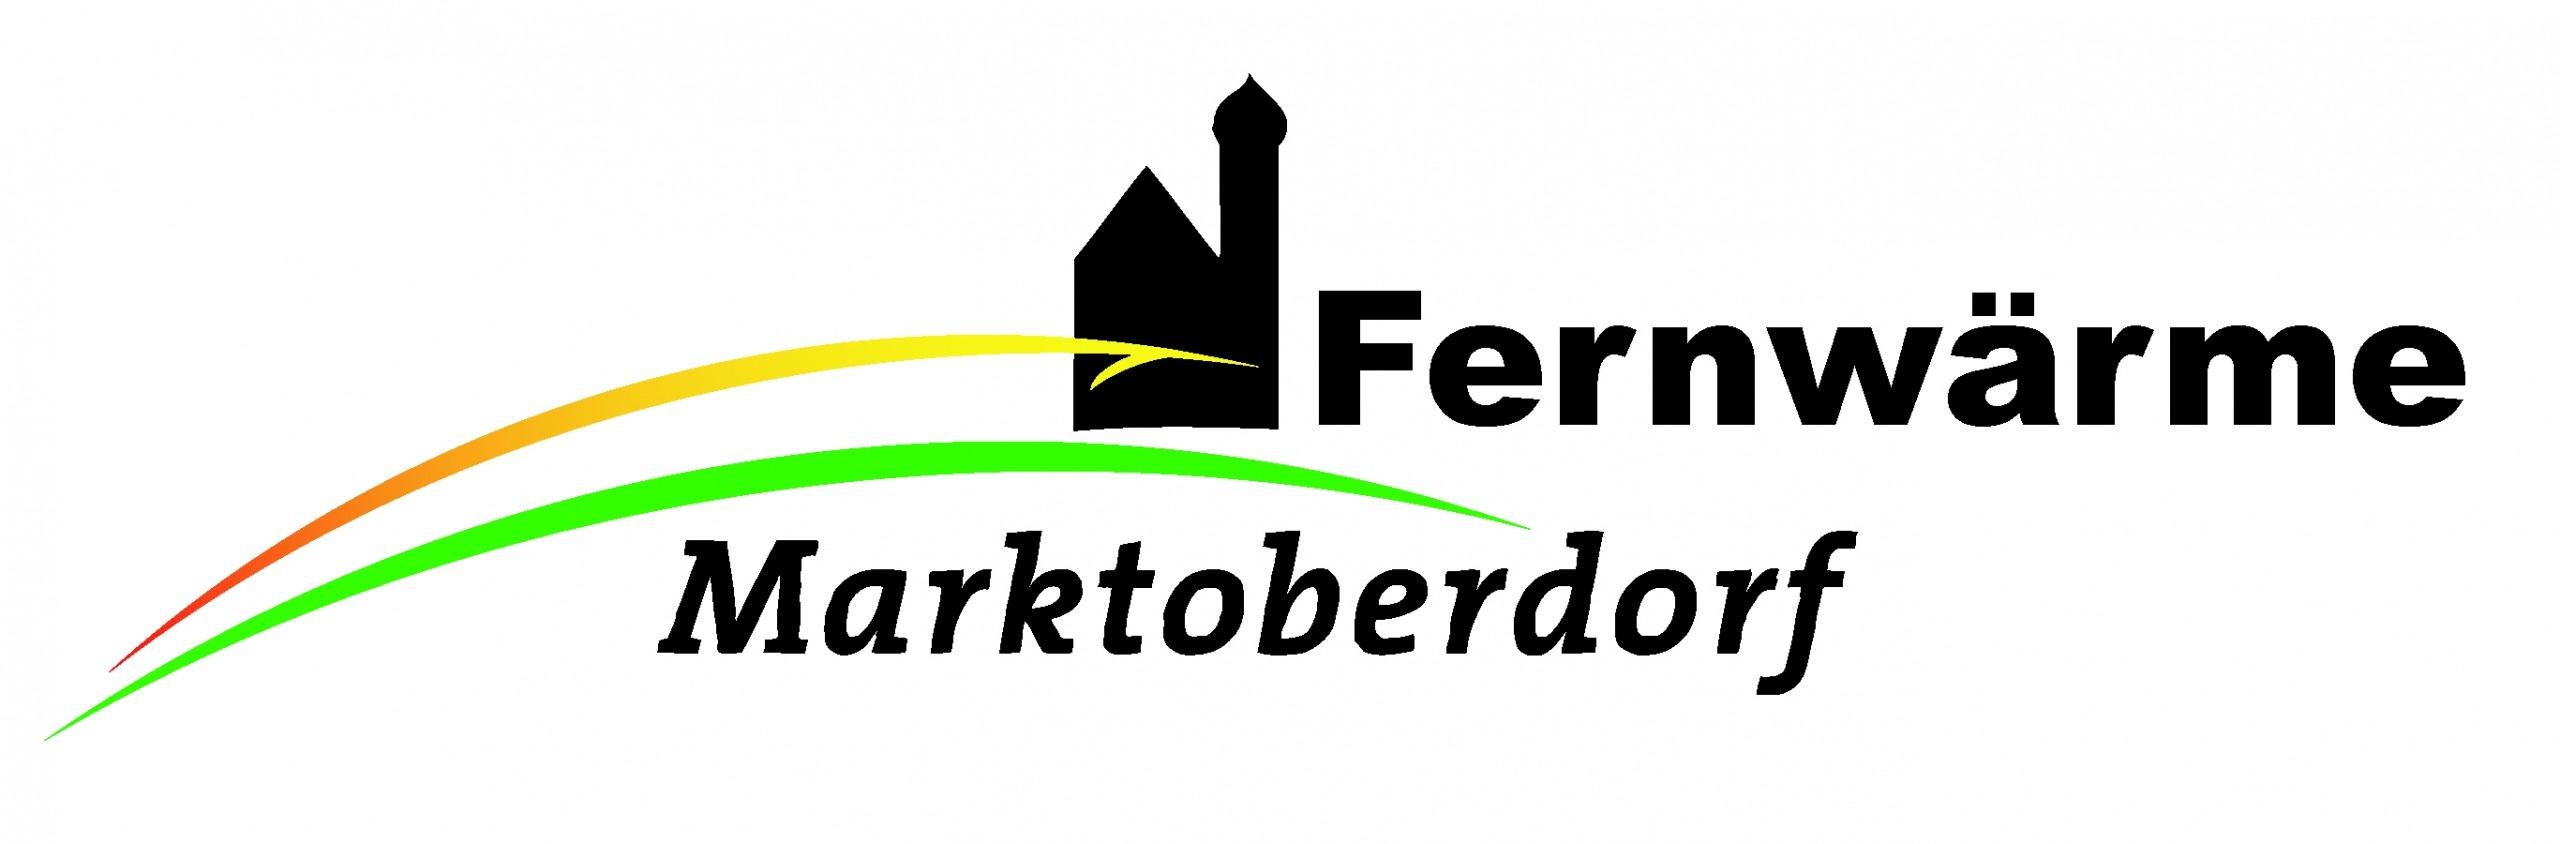 Fernwärme Marktoberdorf GmbH